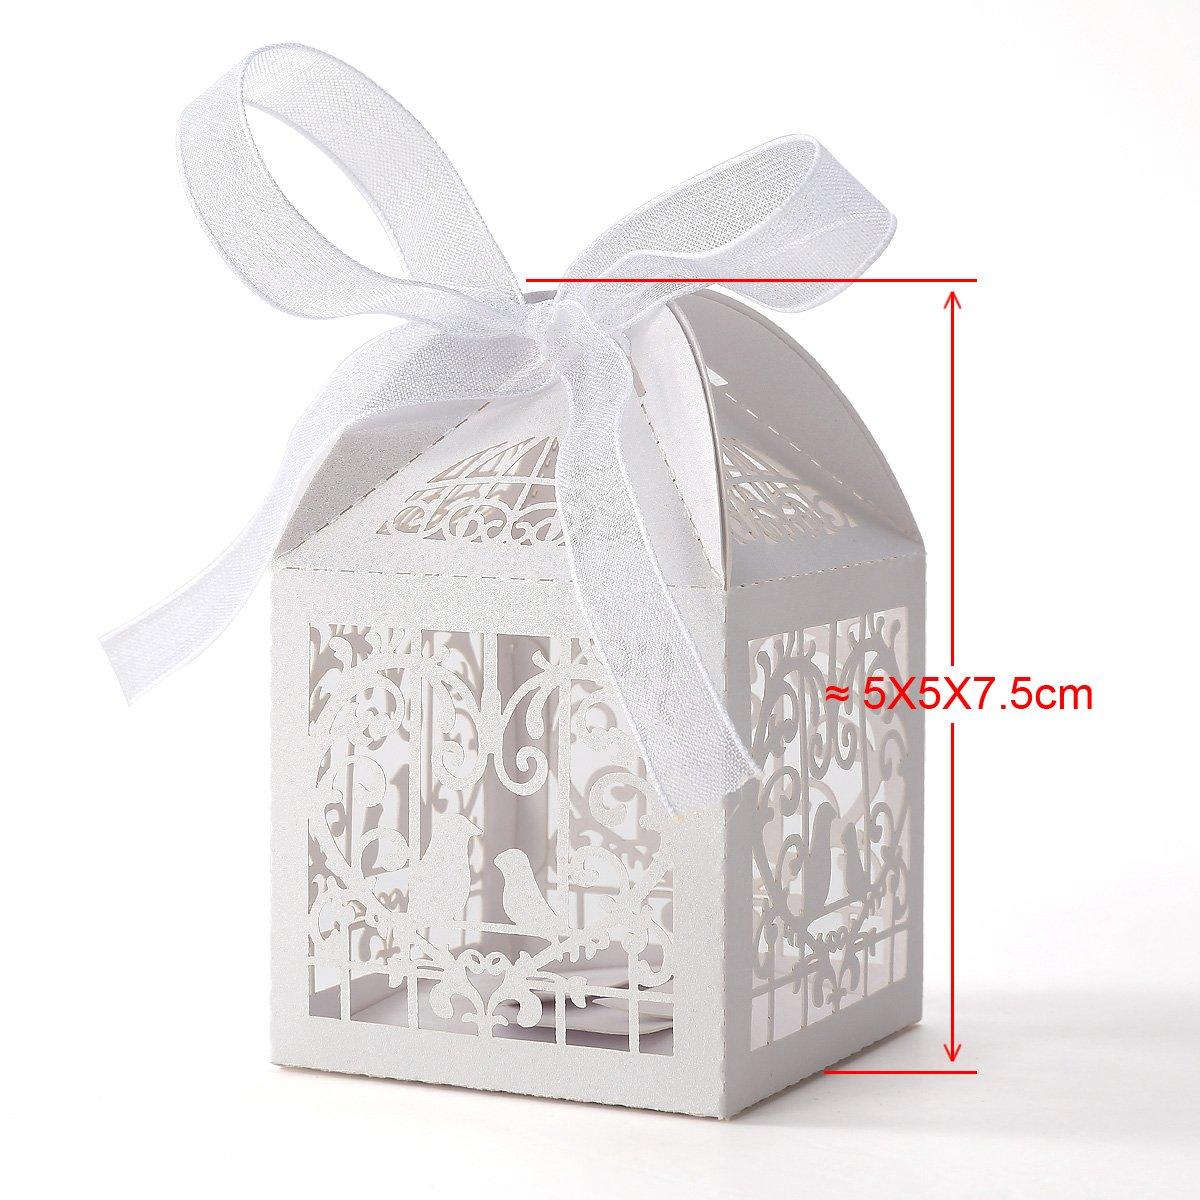 Amazon.com: Gospire 50pcs Deluxe Party Wedding Favor Super Gift ...